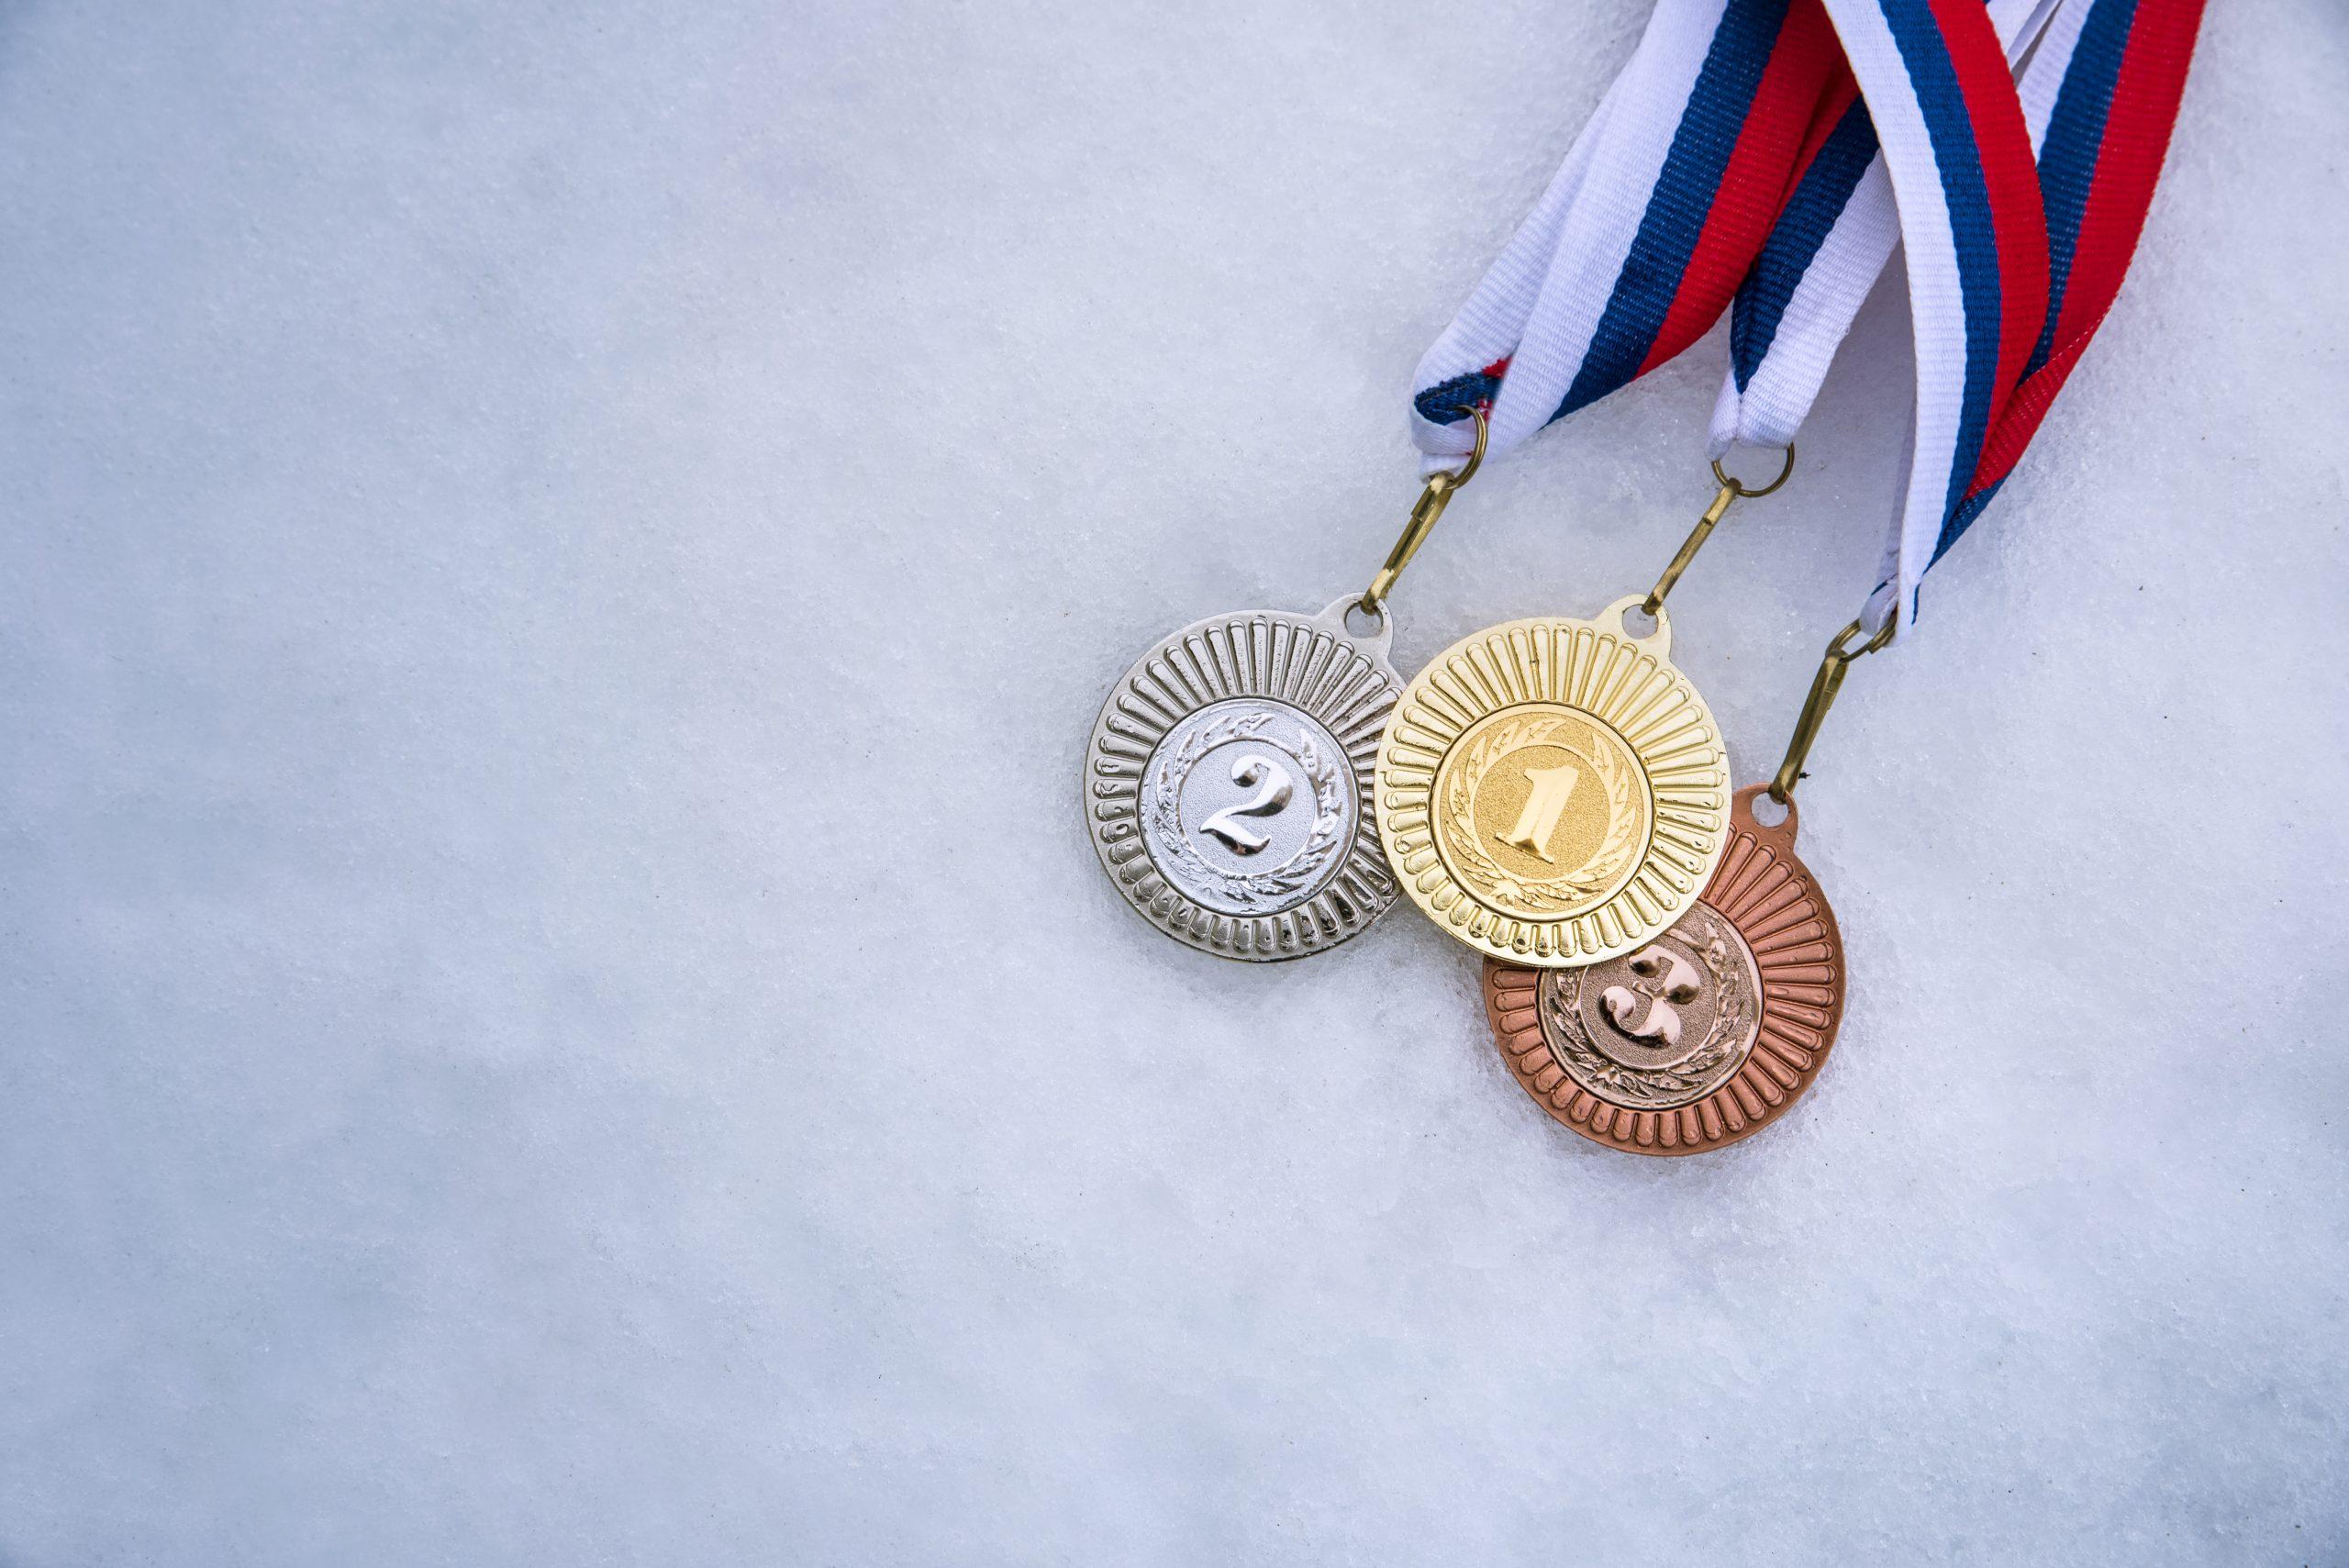 Colorado Springs--Go For The Gold